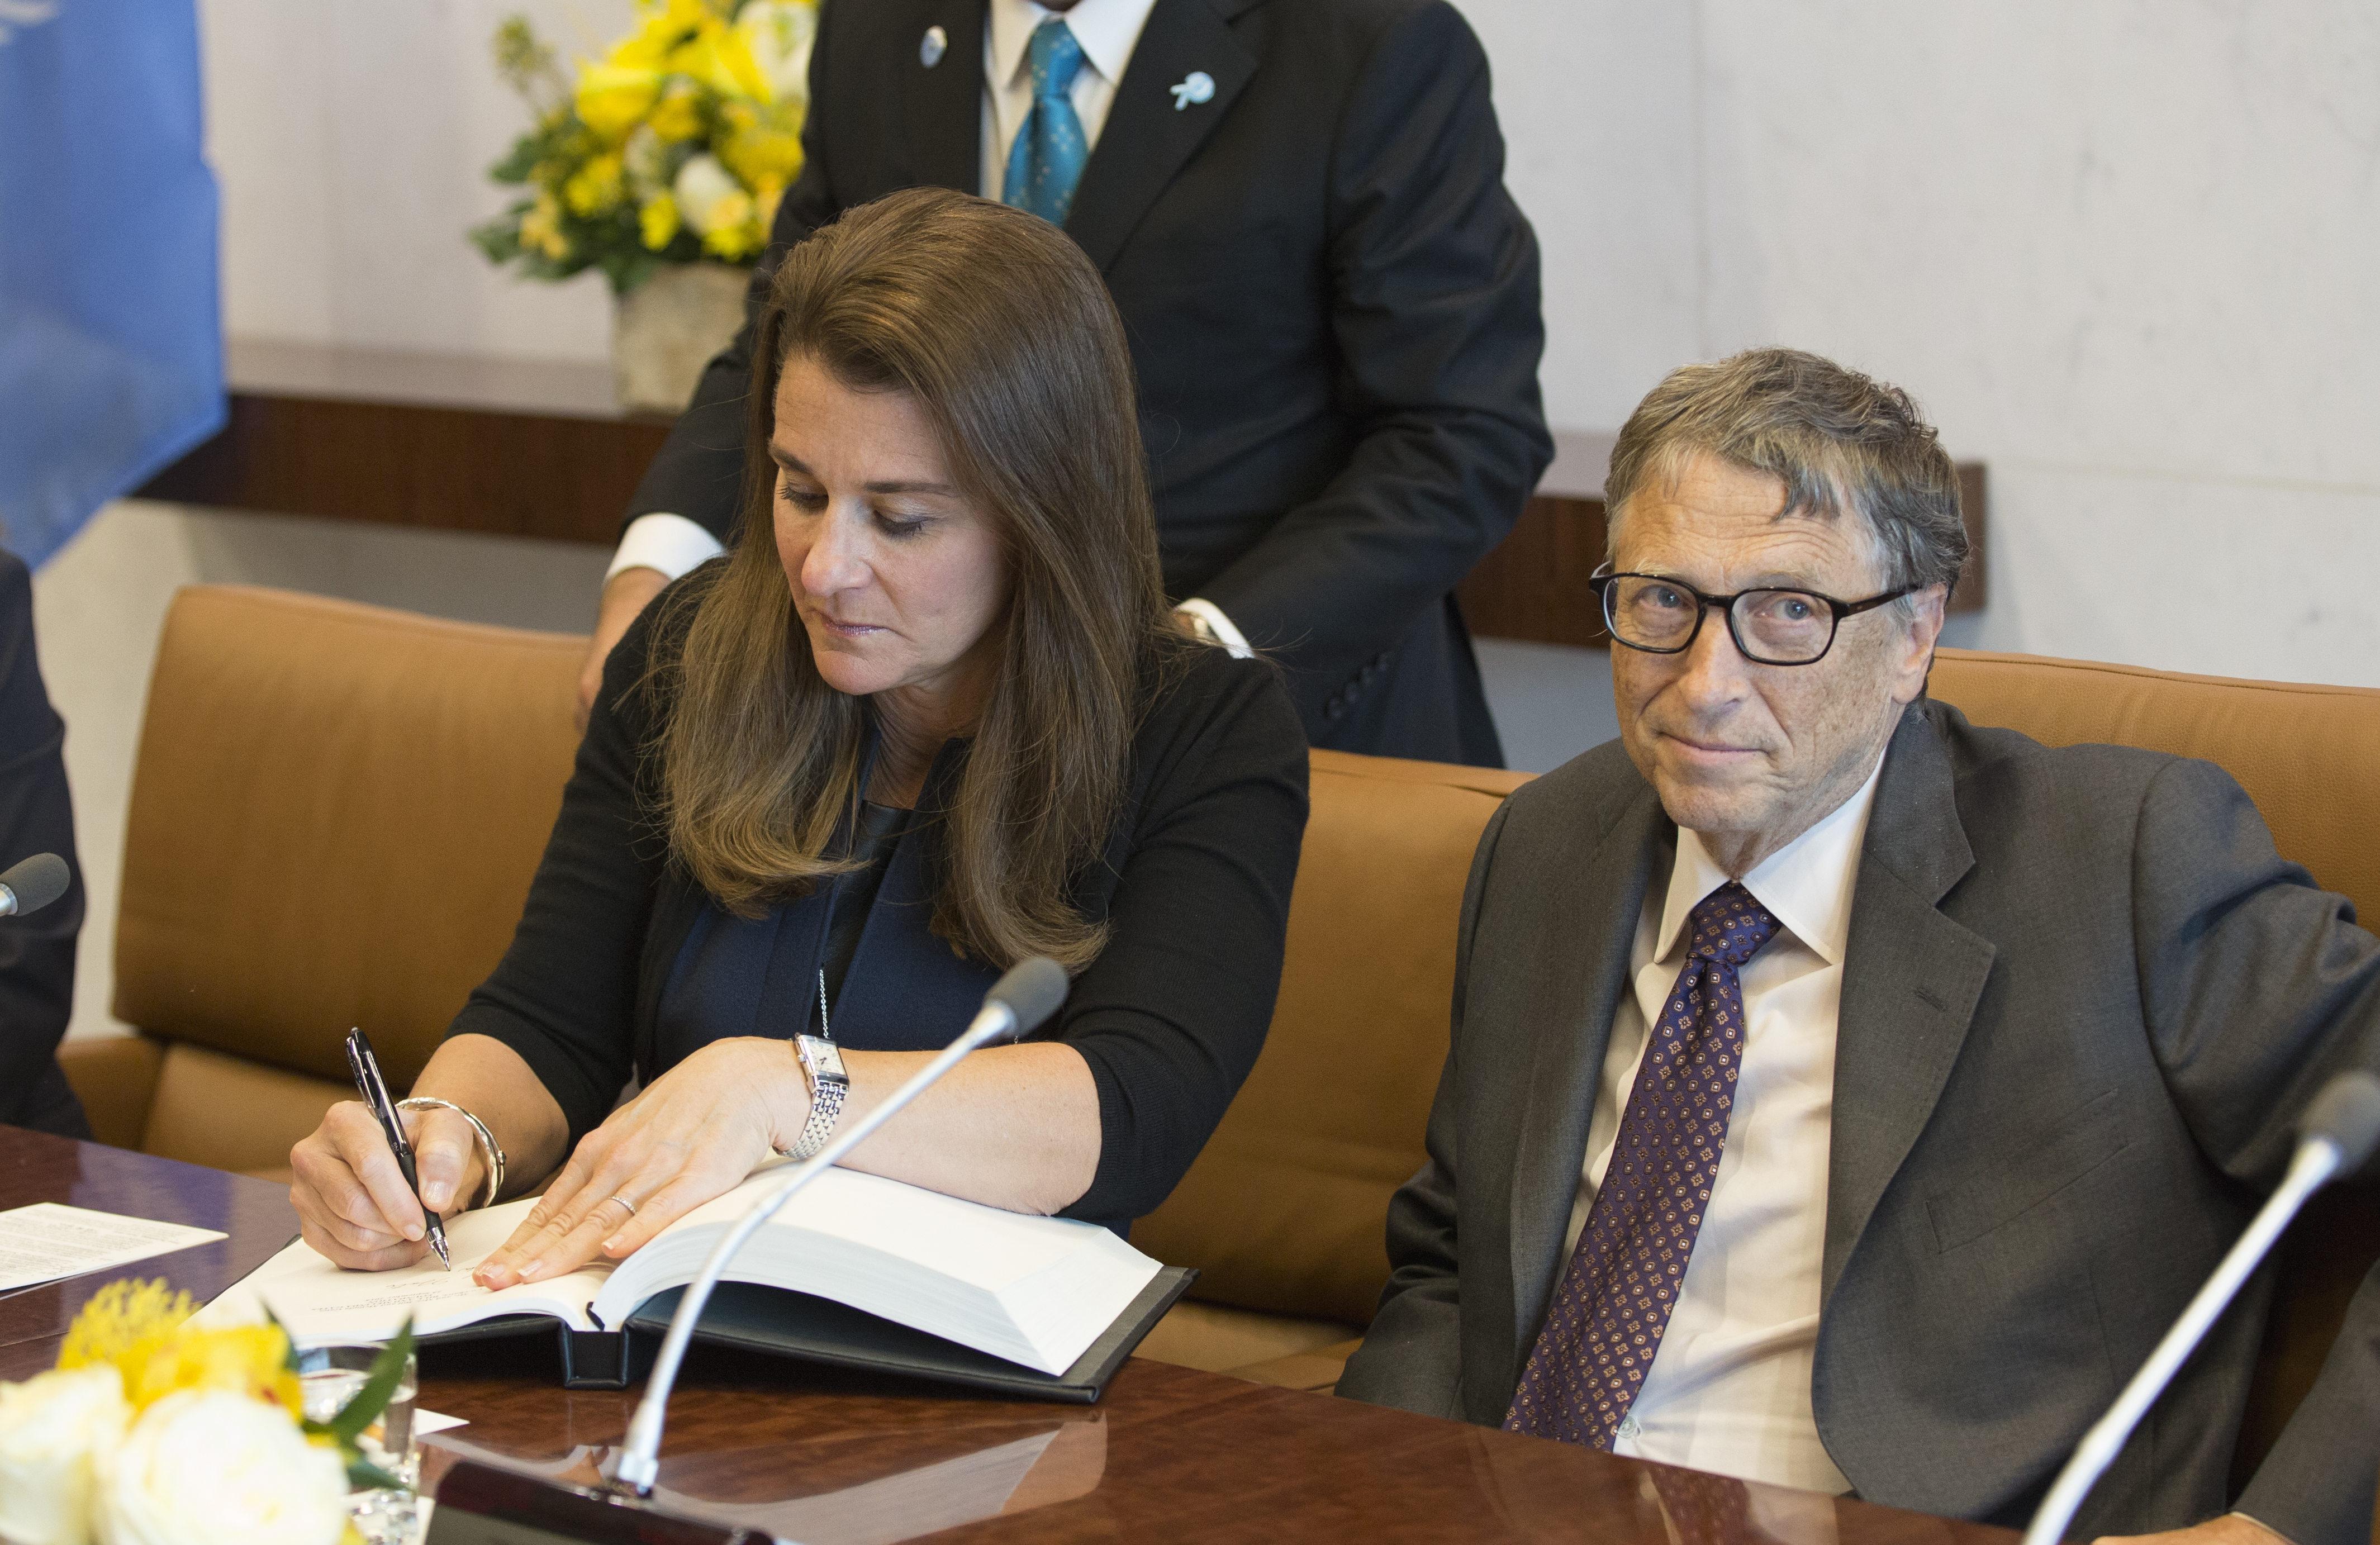 Мелинда и Билл Гейтс женаты с 1994 года. Фото: GLOBAL LOOK PRESS